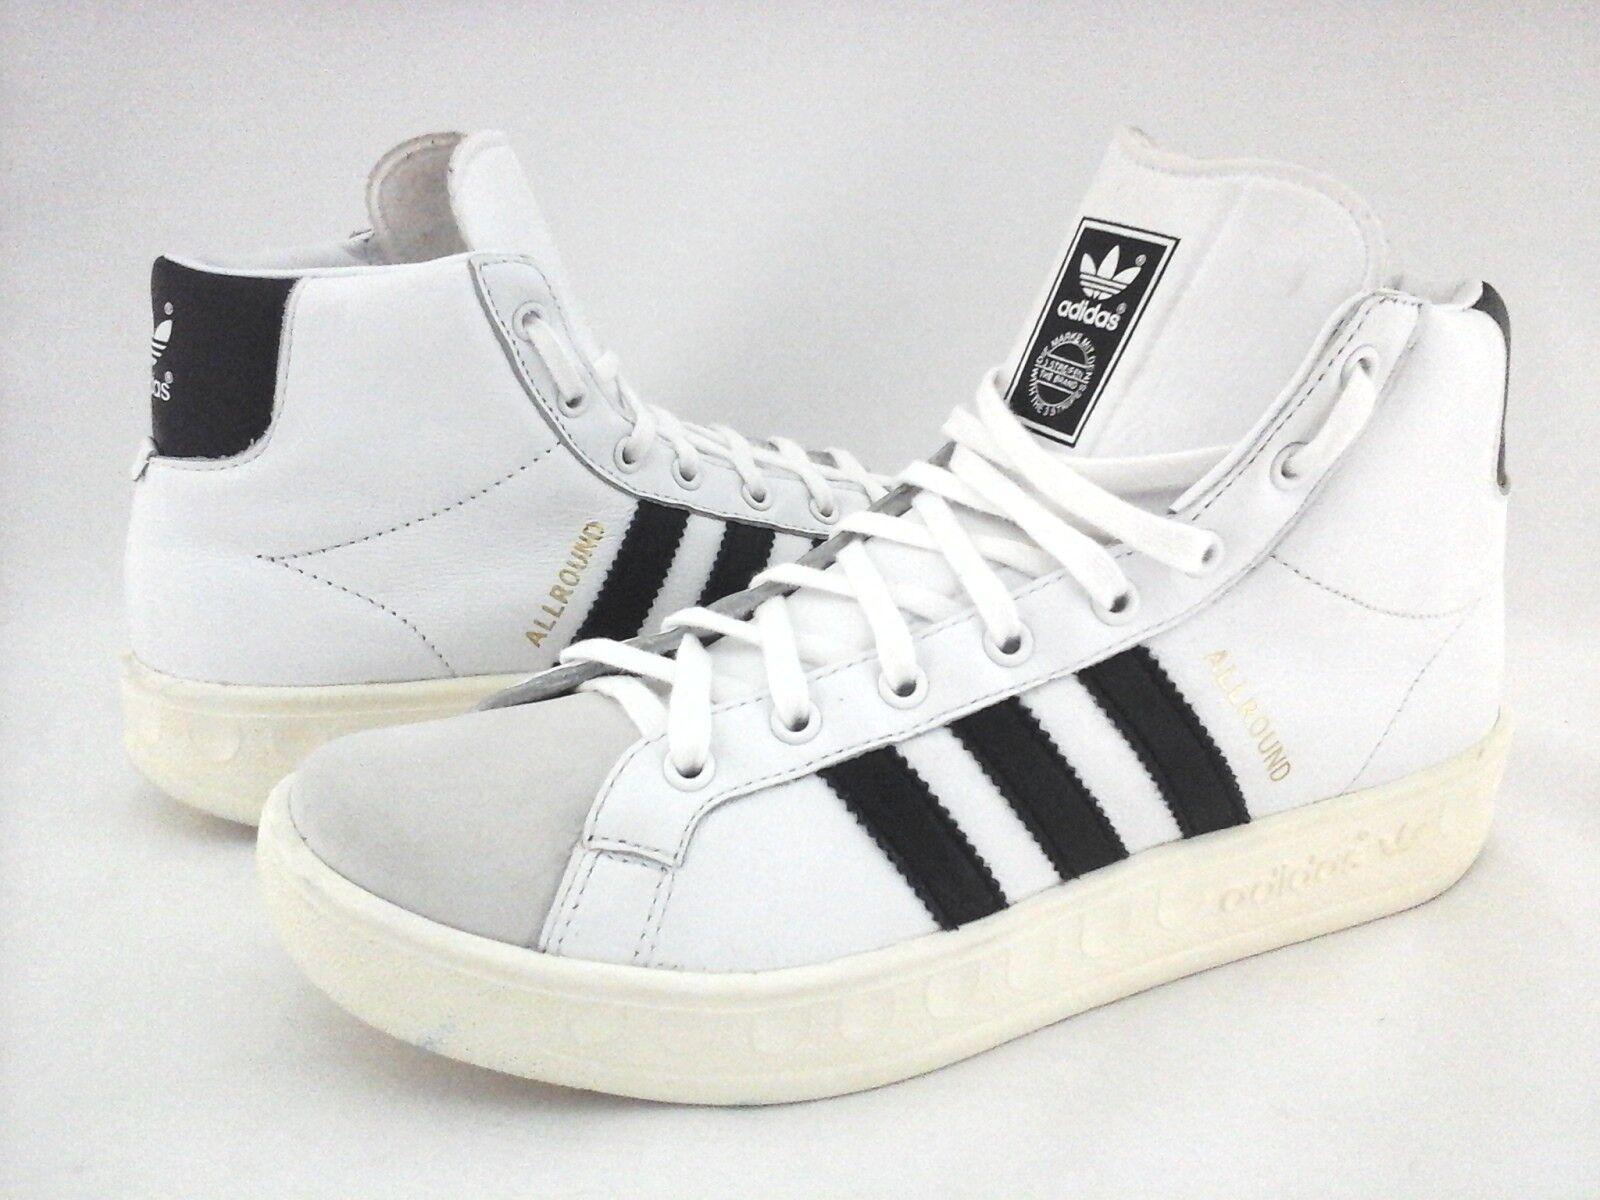 la taille de la nmd r2 primeknit chaussures chaussures chaussures adidas 6,5 | Outlet  446df2